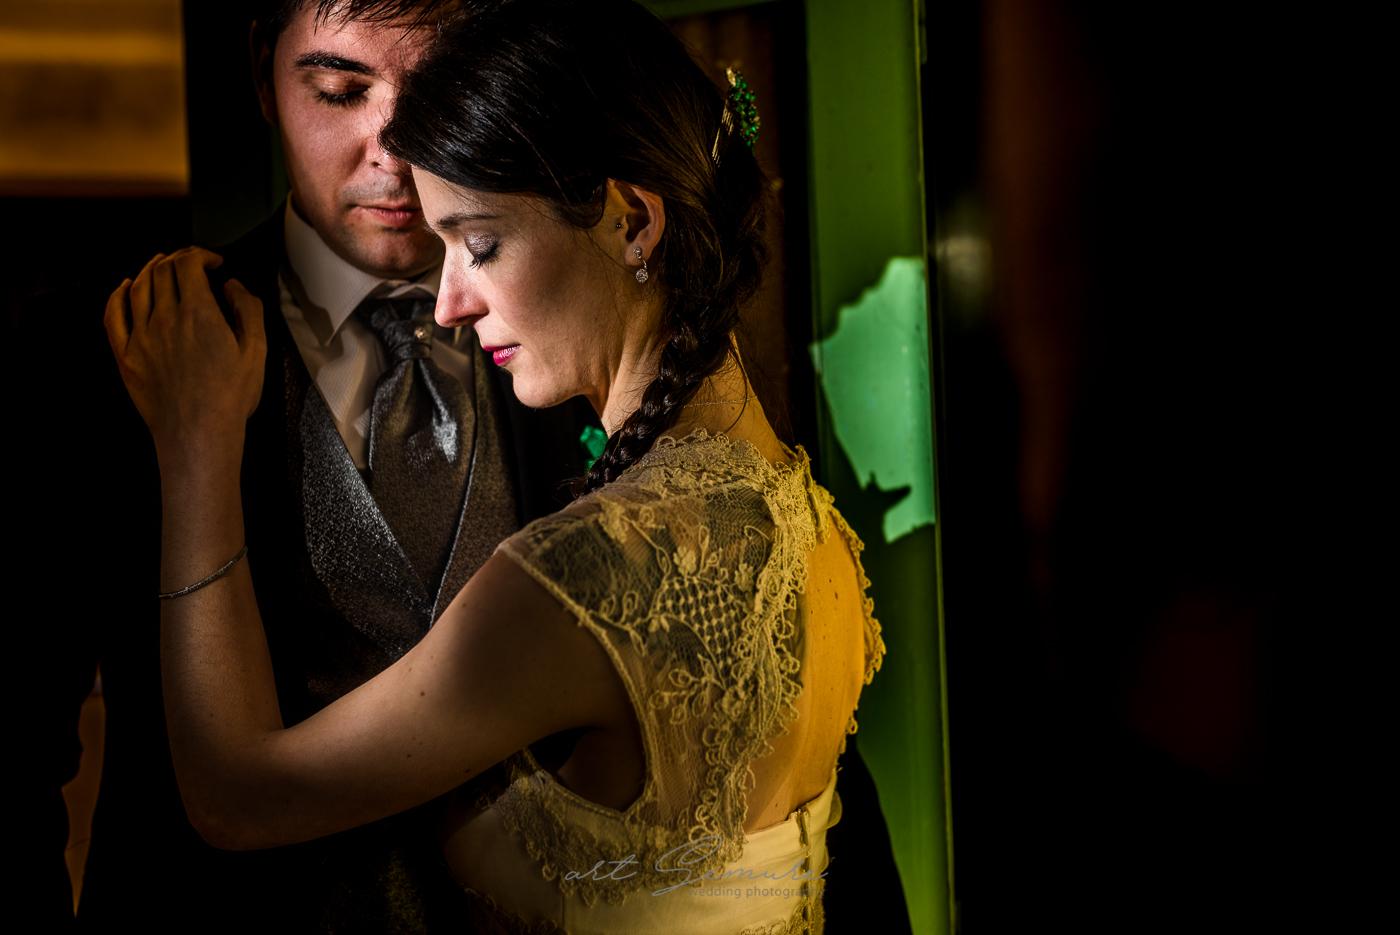 fotografo boda emotiva zamora salto de castro 11_